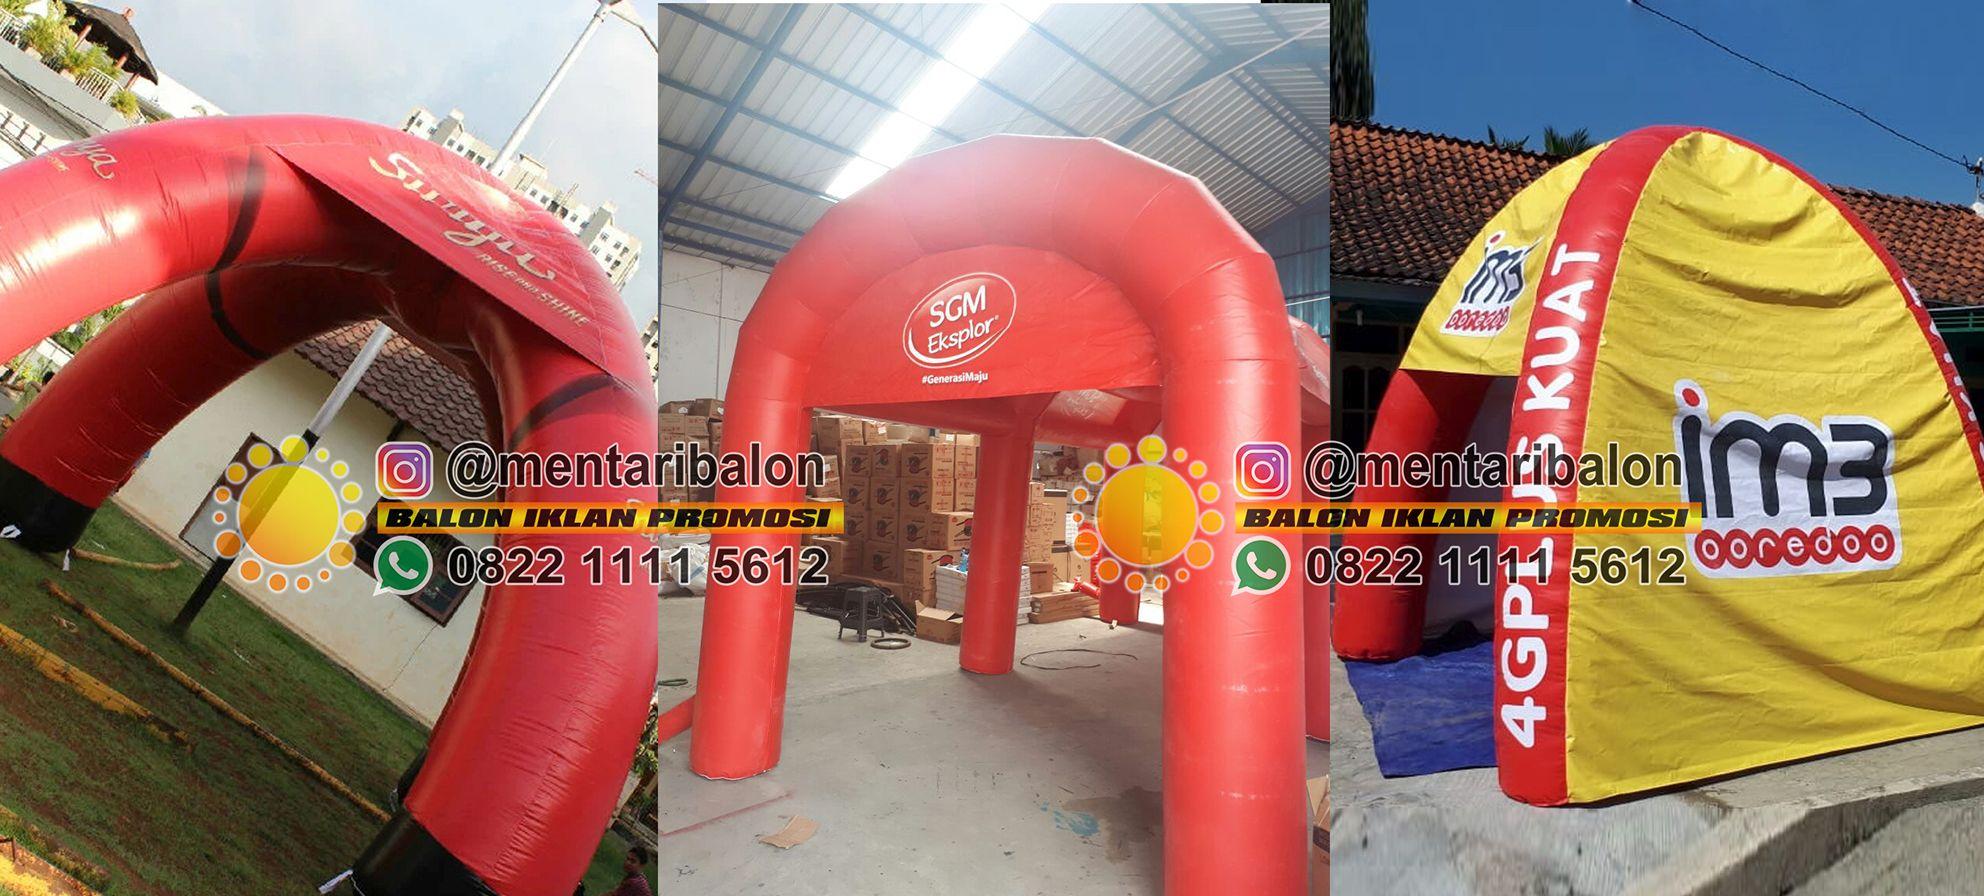 balon tenda promosi